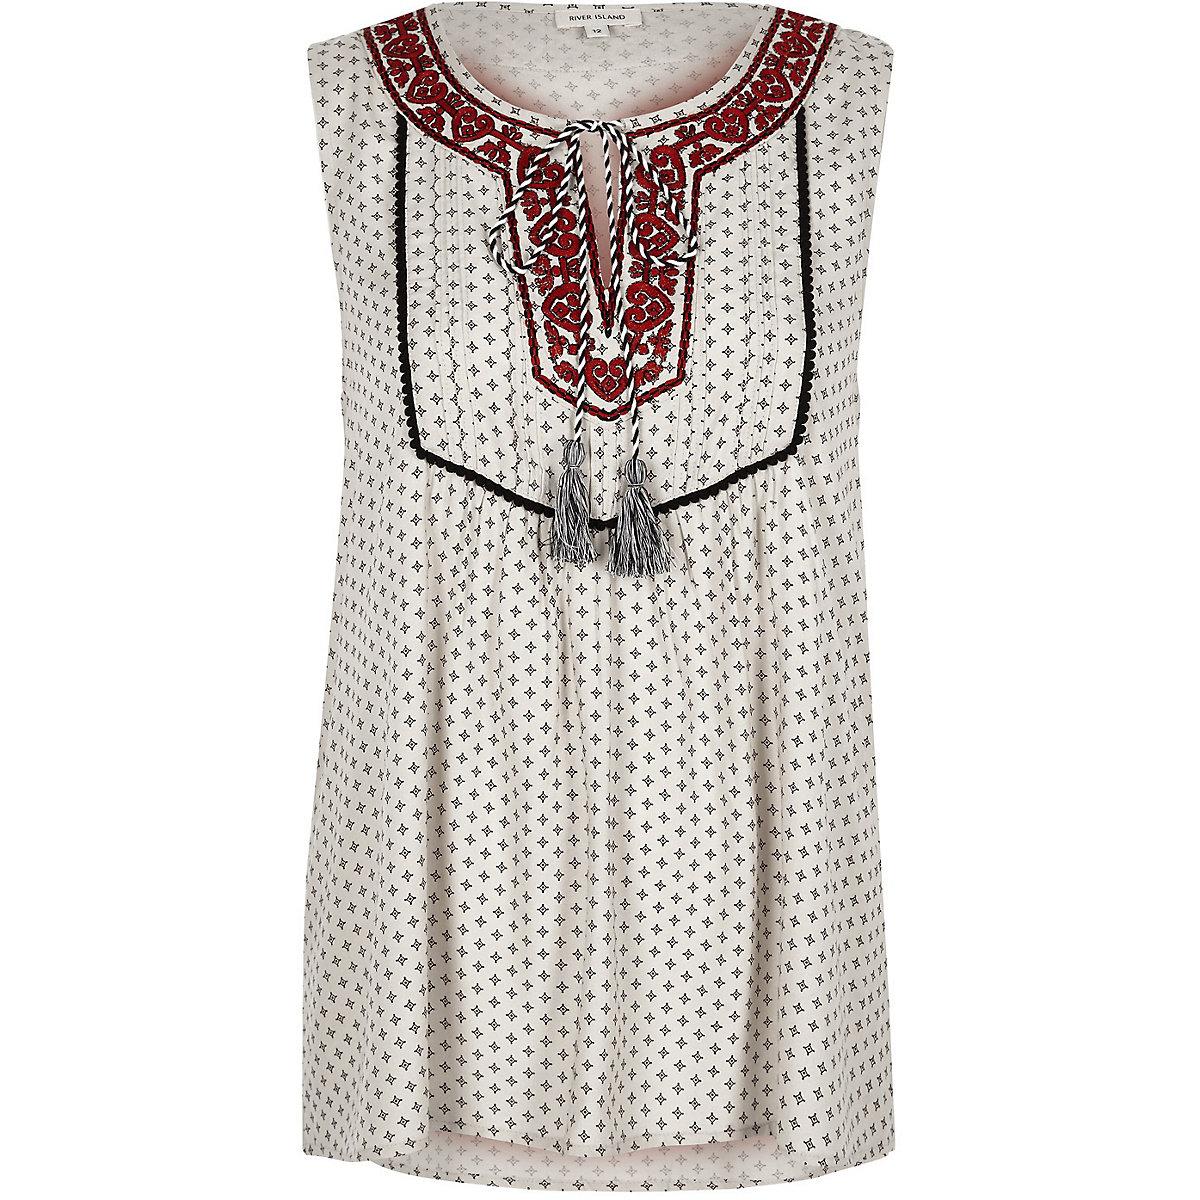 Cream print embroidered sleeveless top